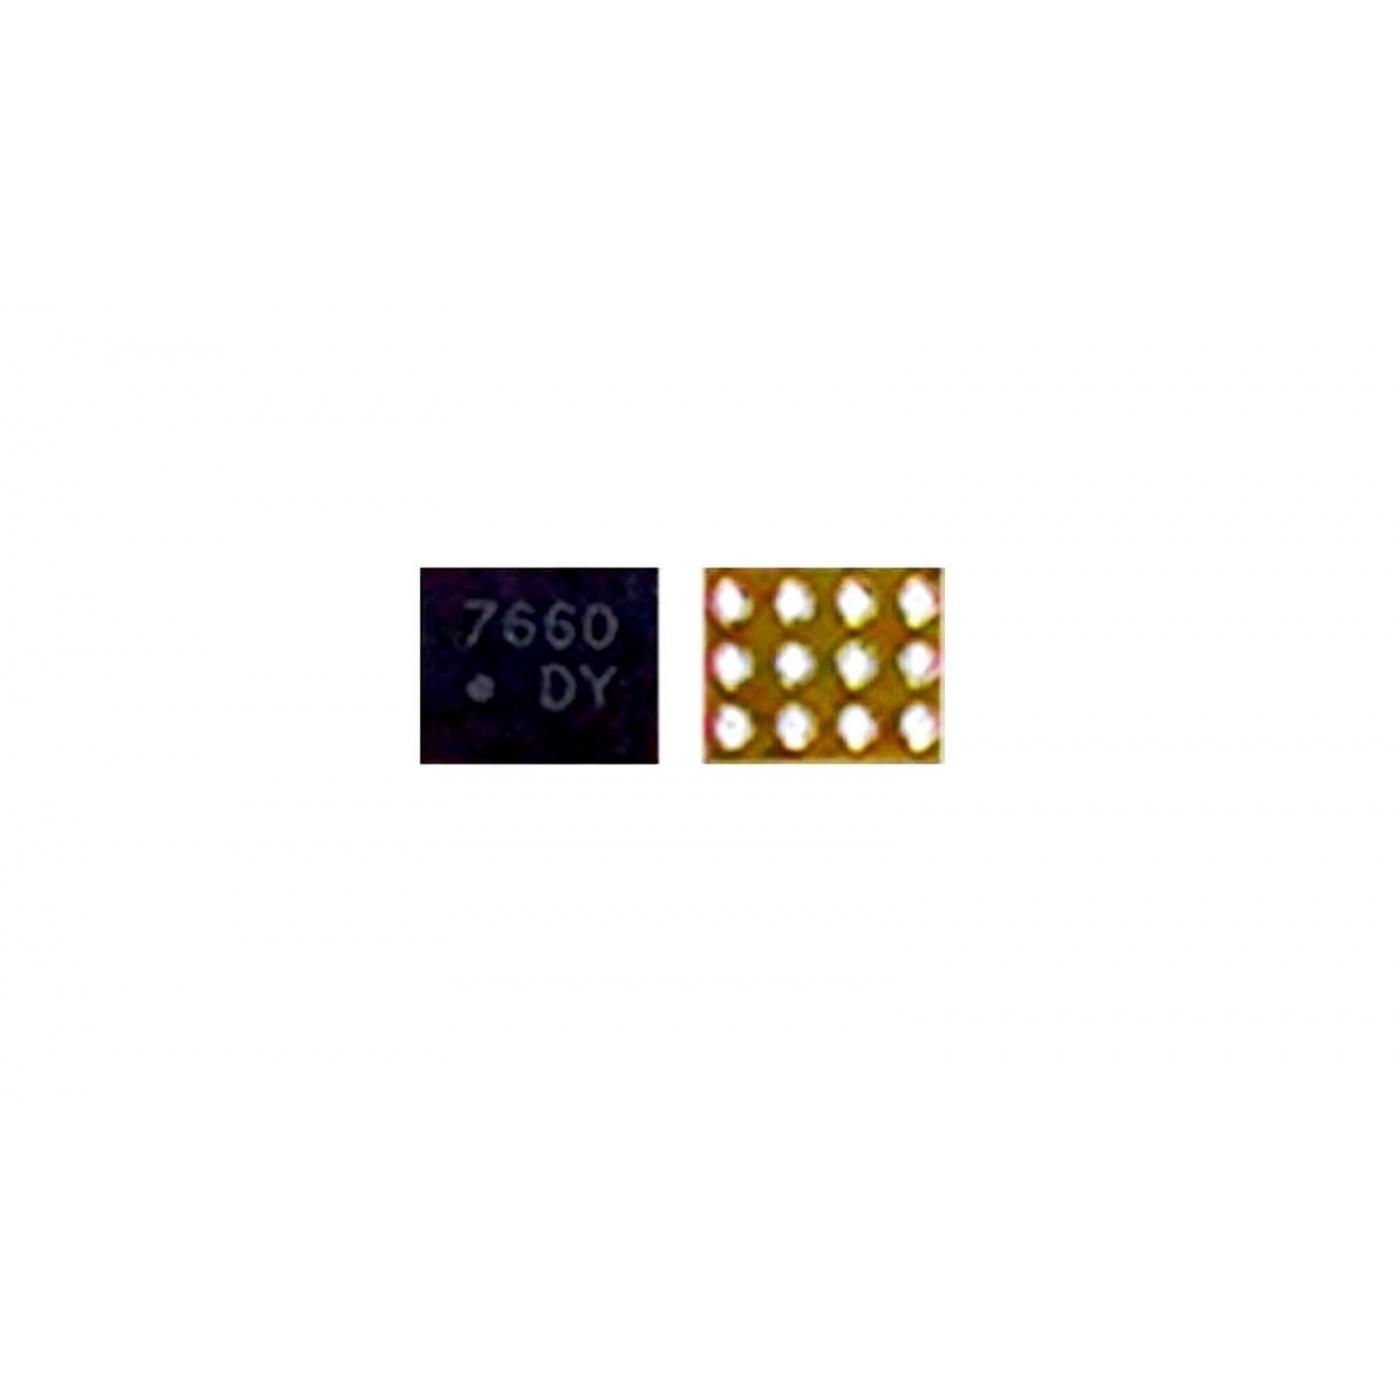 IC CHIP U1502 - U1580 12 Pin Light Control Backlight for IPHONE 6 - 6 Plus